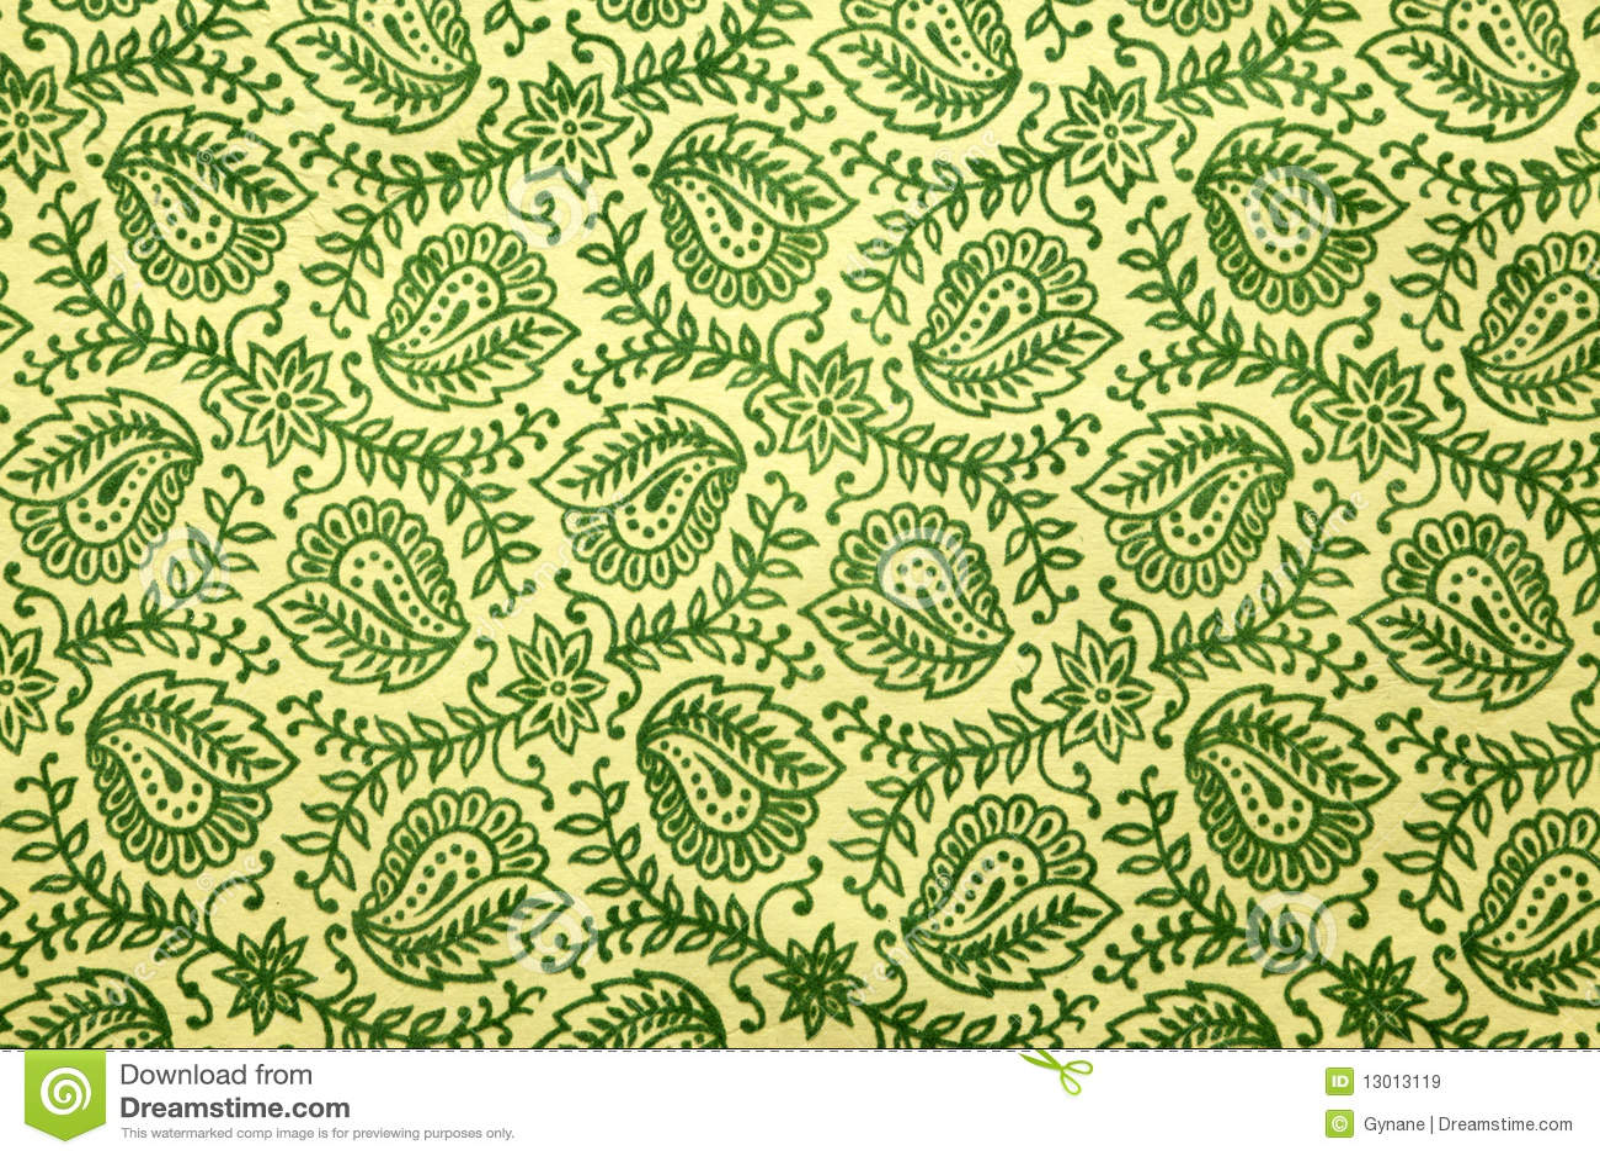 Paisley zielony wzór